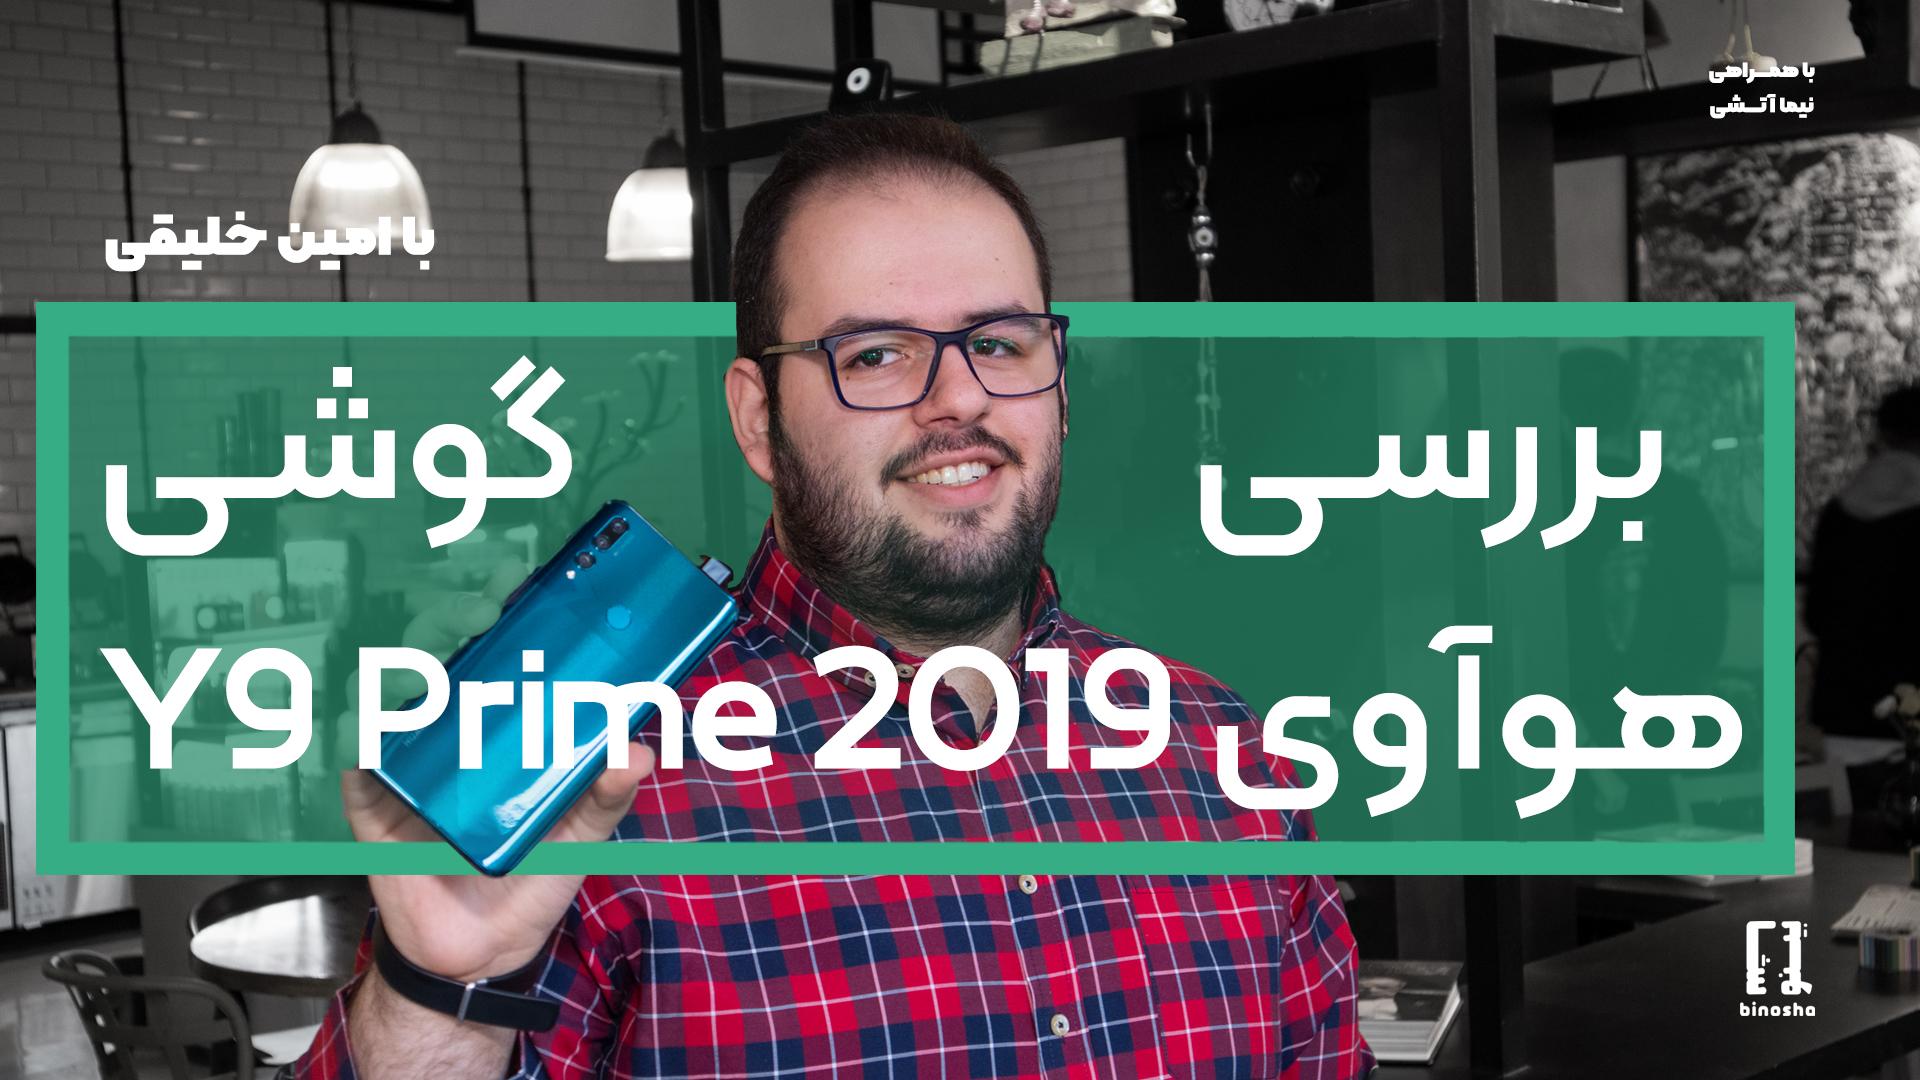 هوآوی Y9 Prime 2019